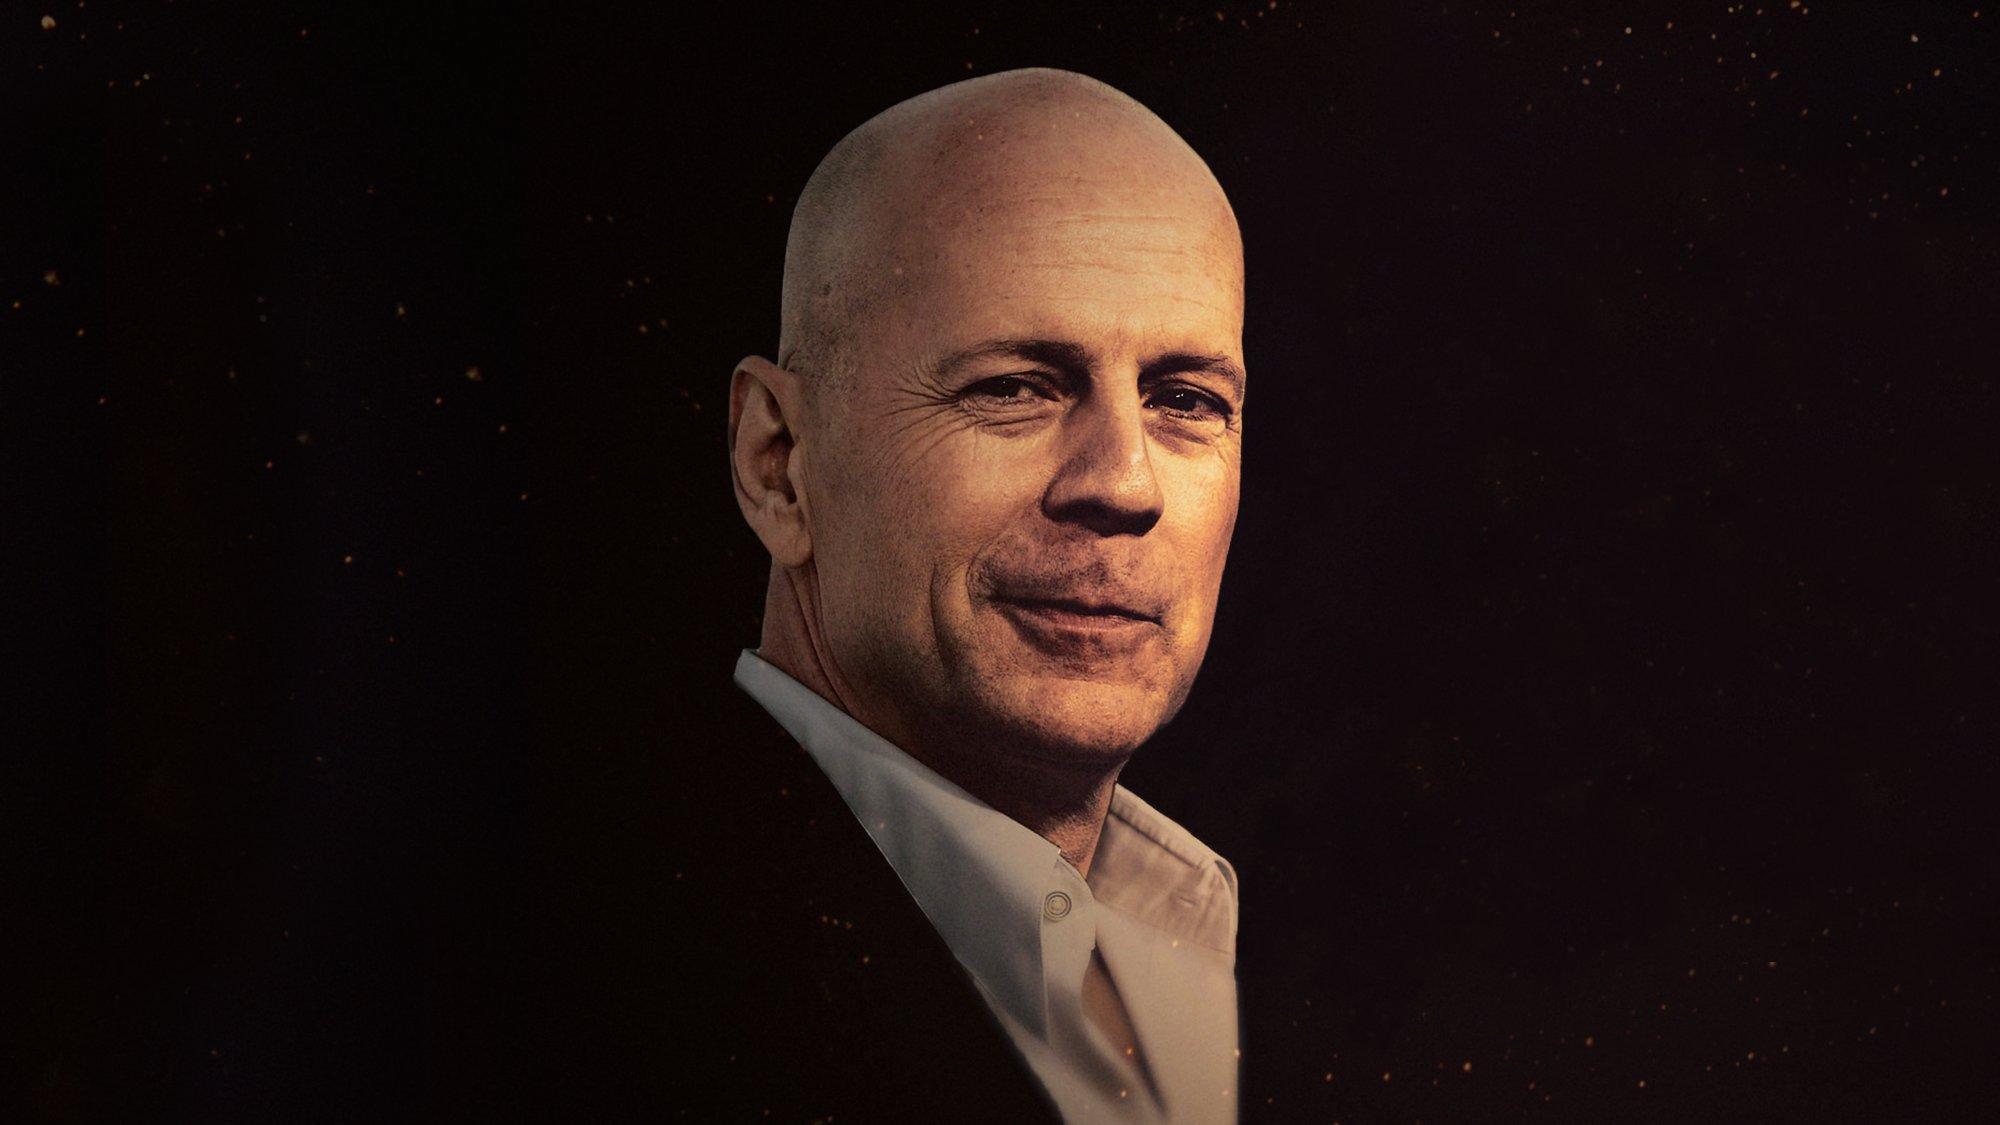 Roast of Bruce Willis